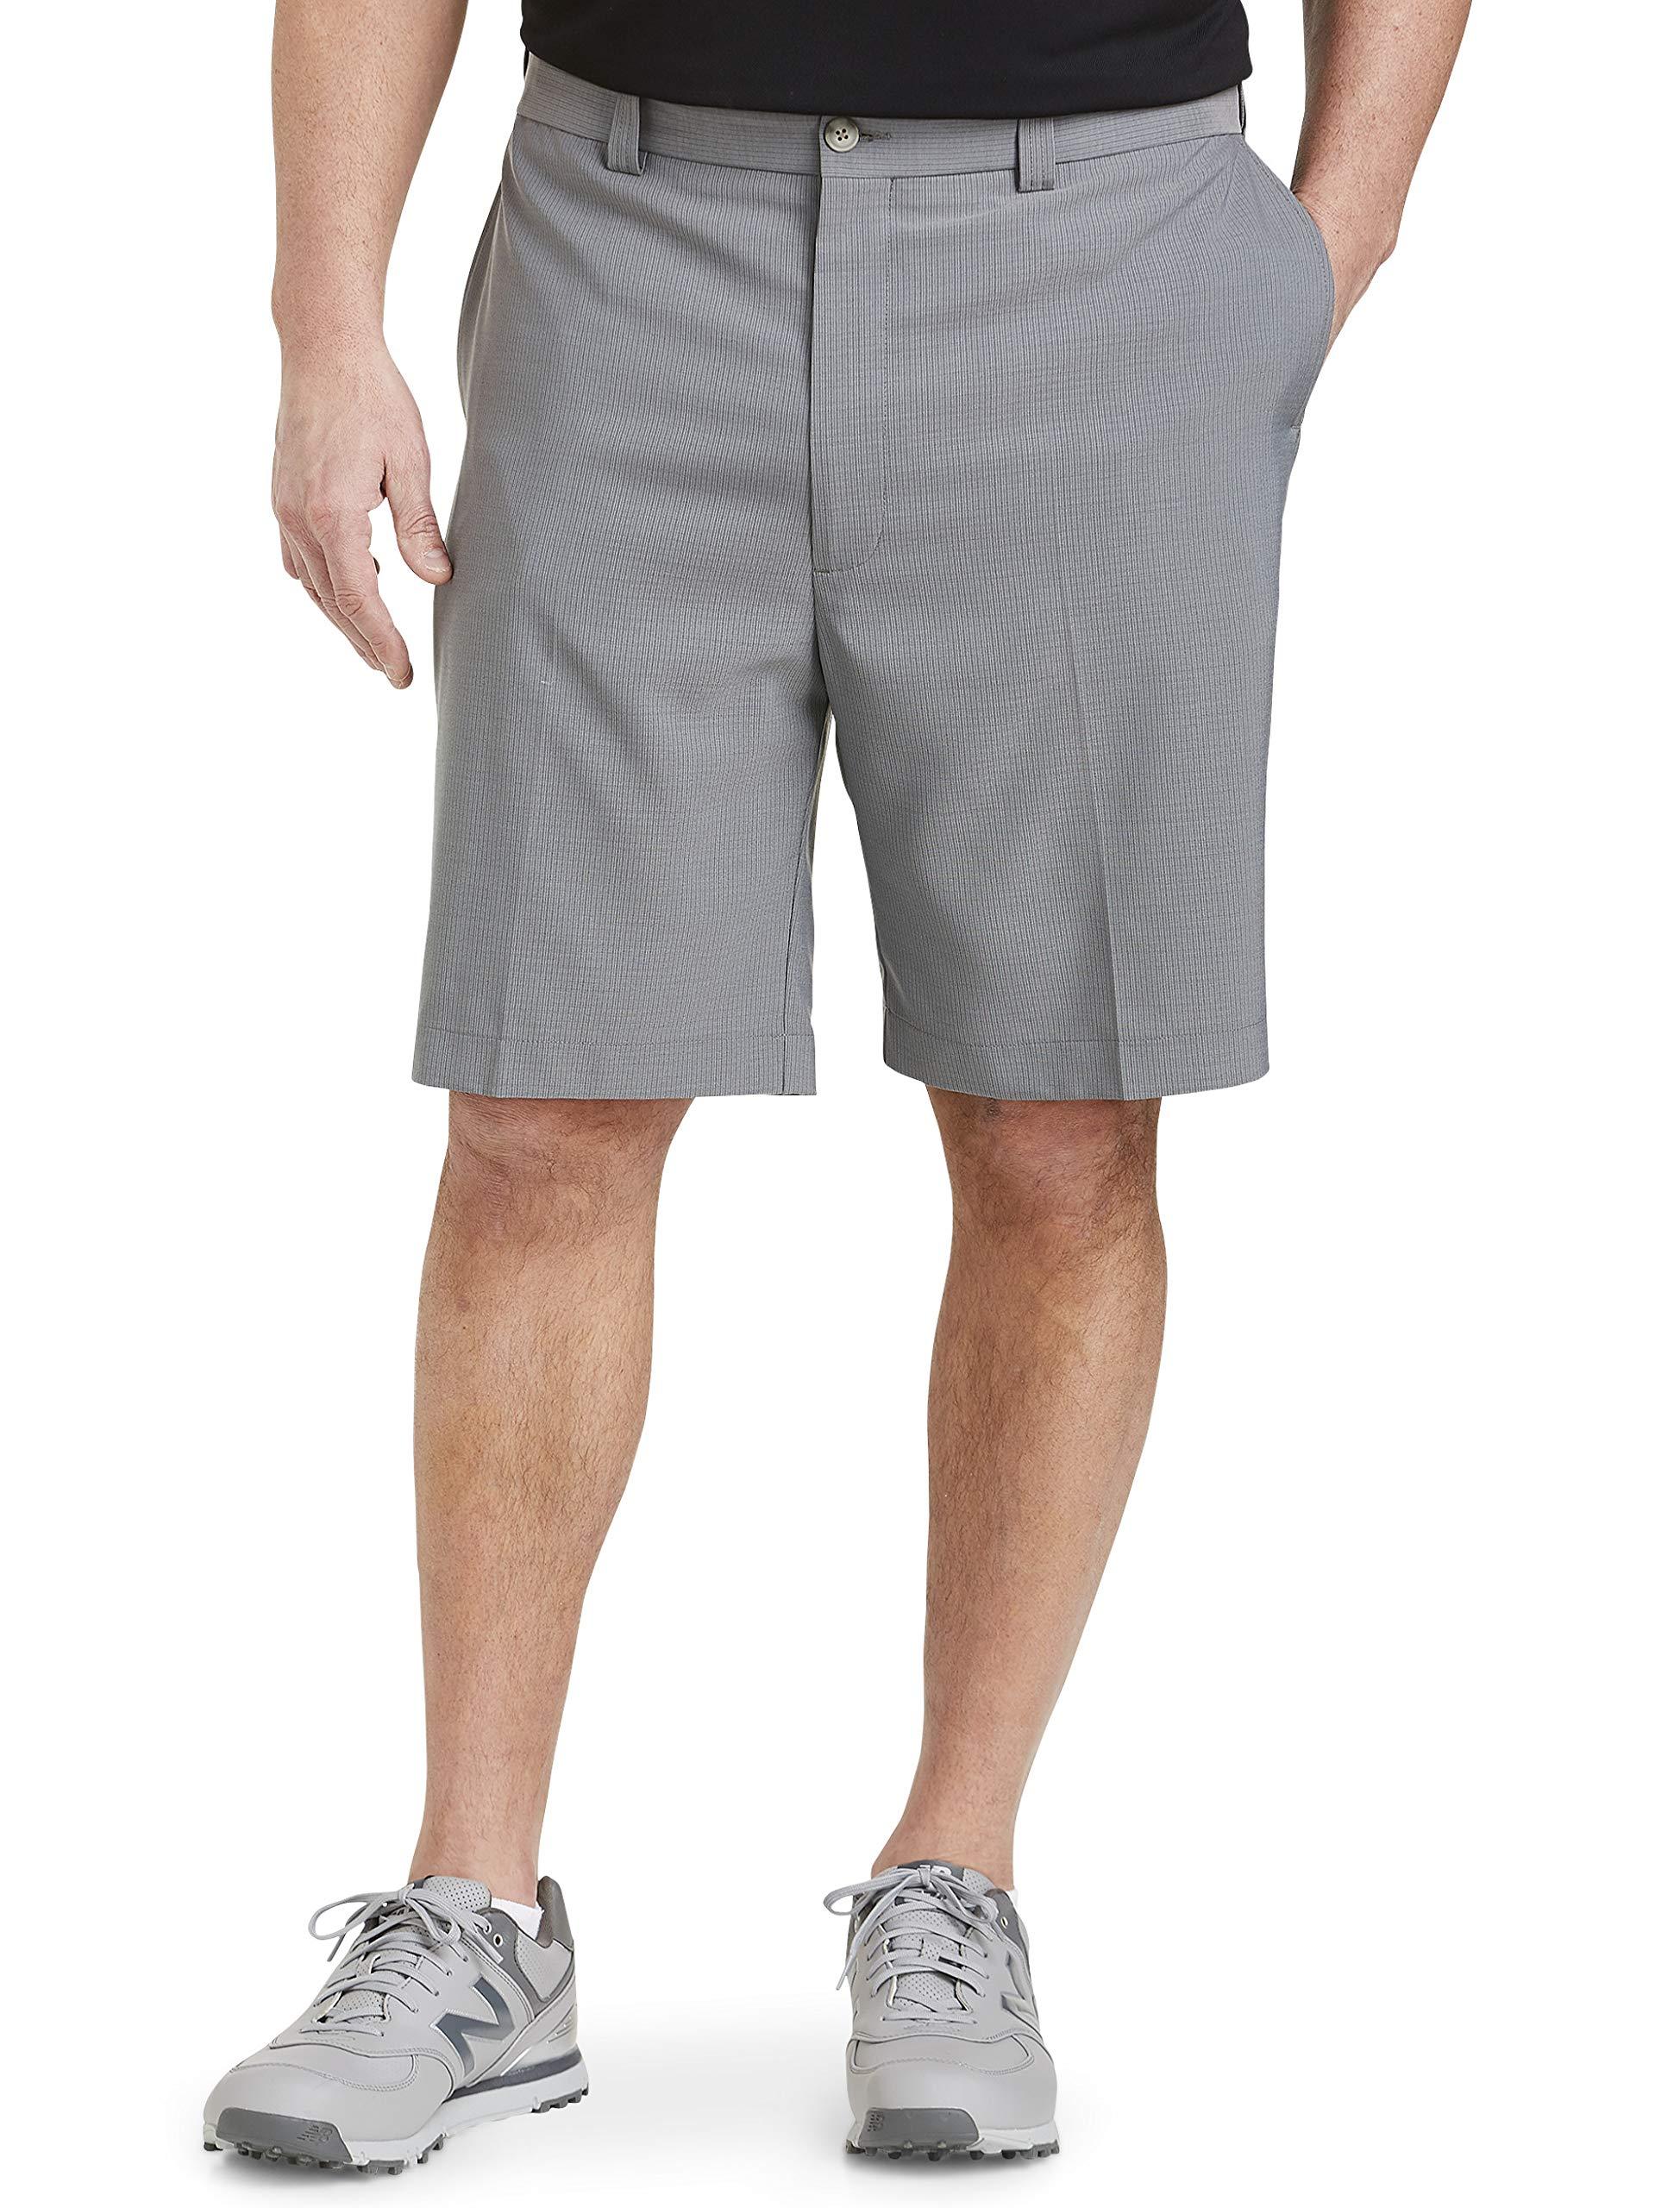 Oak Hill by DXL Big and Tall Waist Relaxer Microfiber Plaid Shorts, Grey Plaid, 46